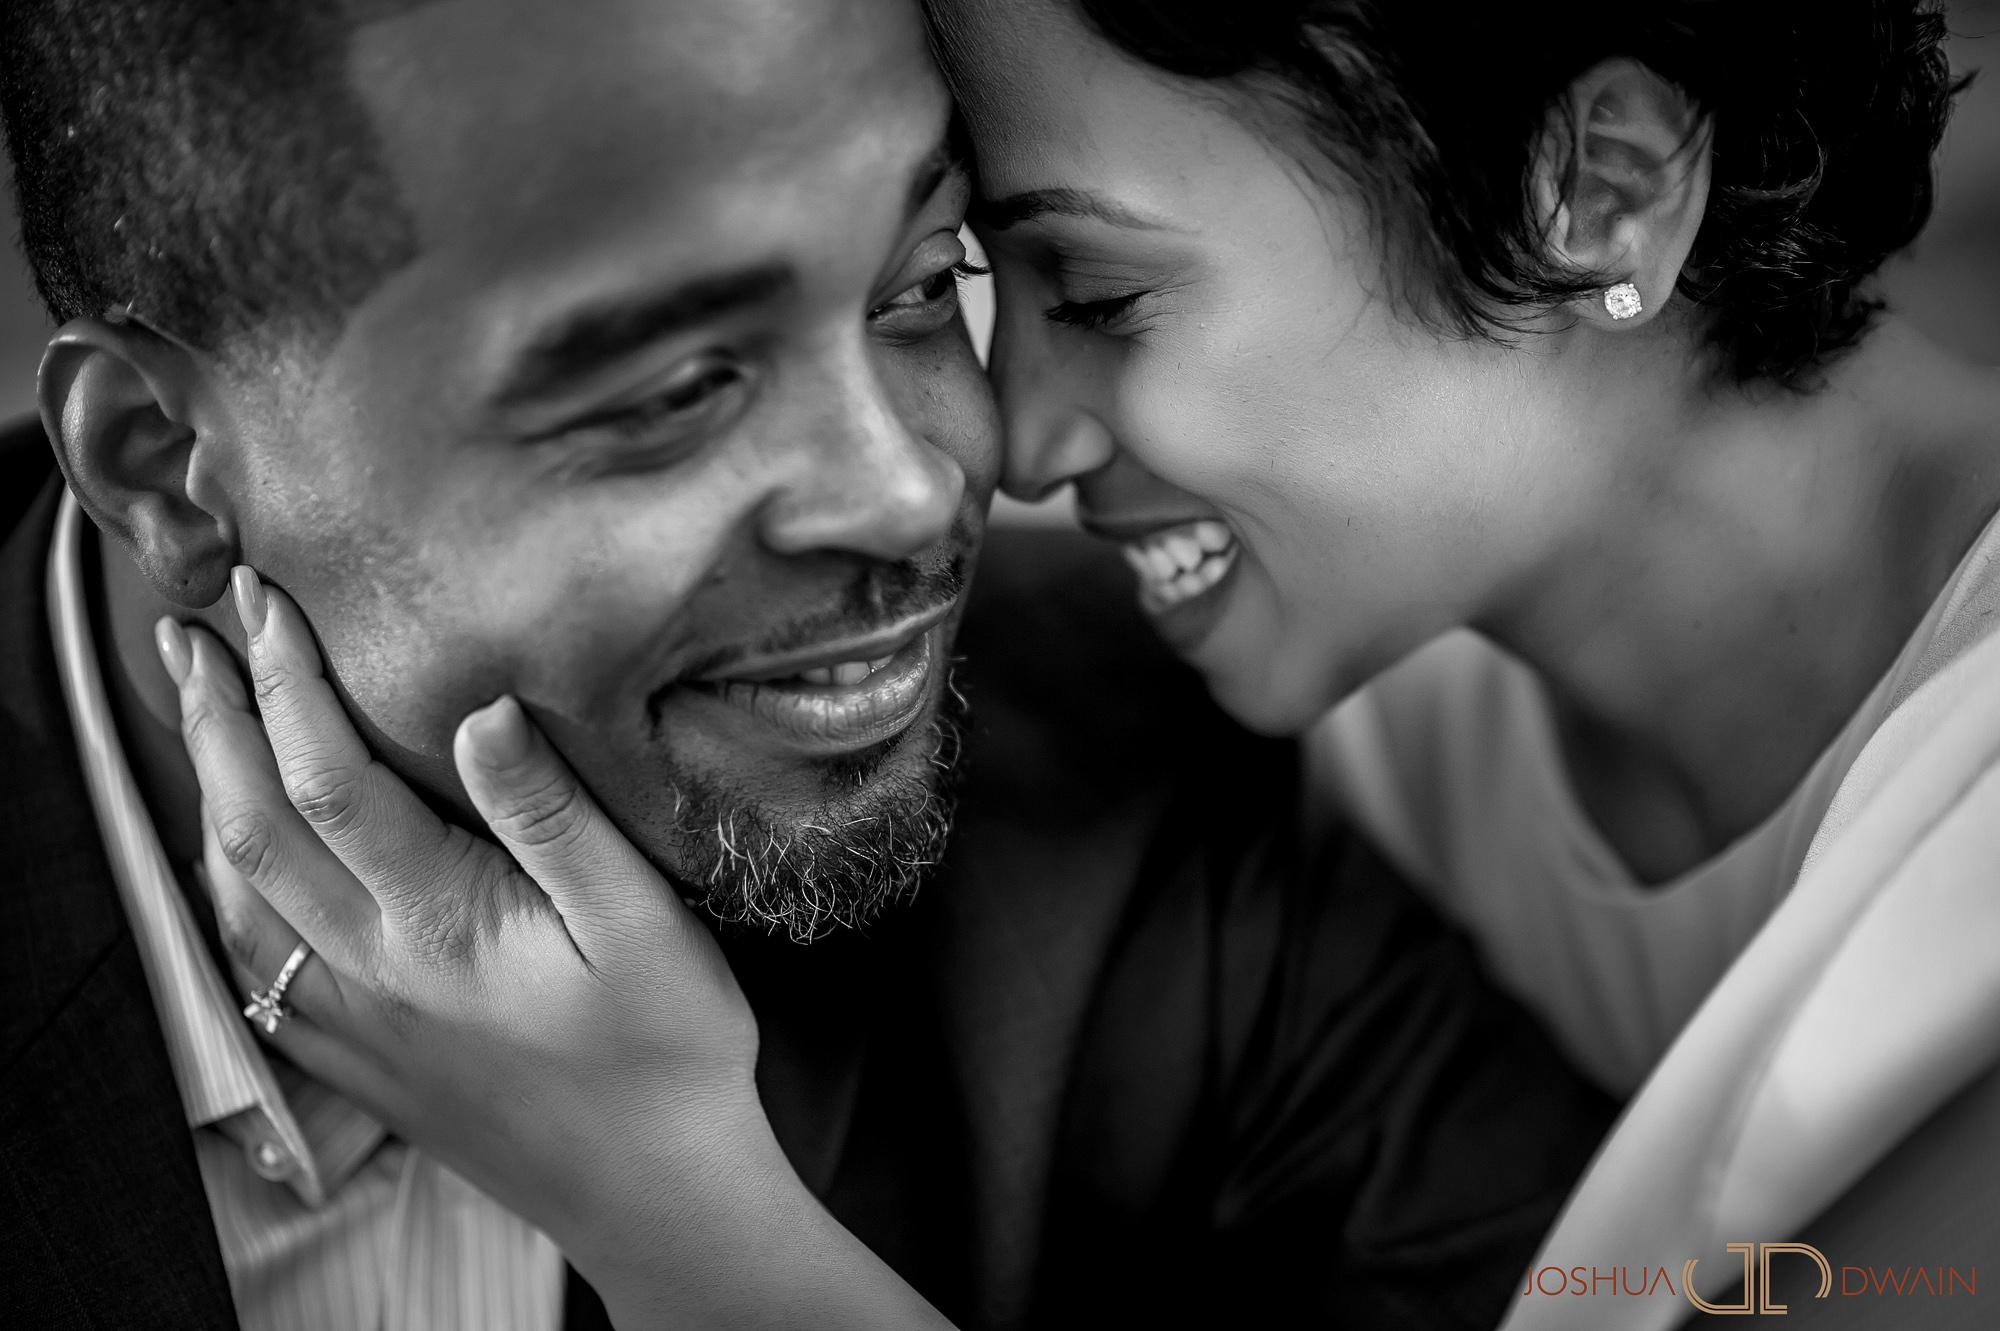 monique-lloyd-002-washington-dc-engagement-photographer-joshua-dwain